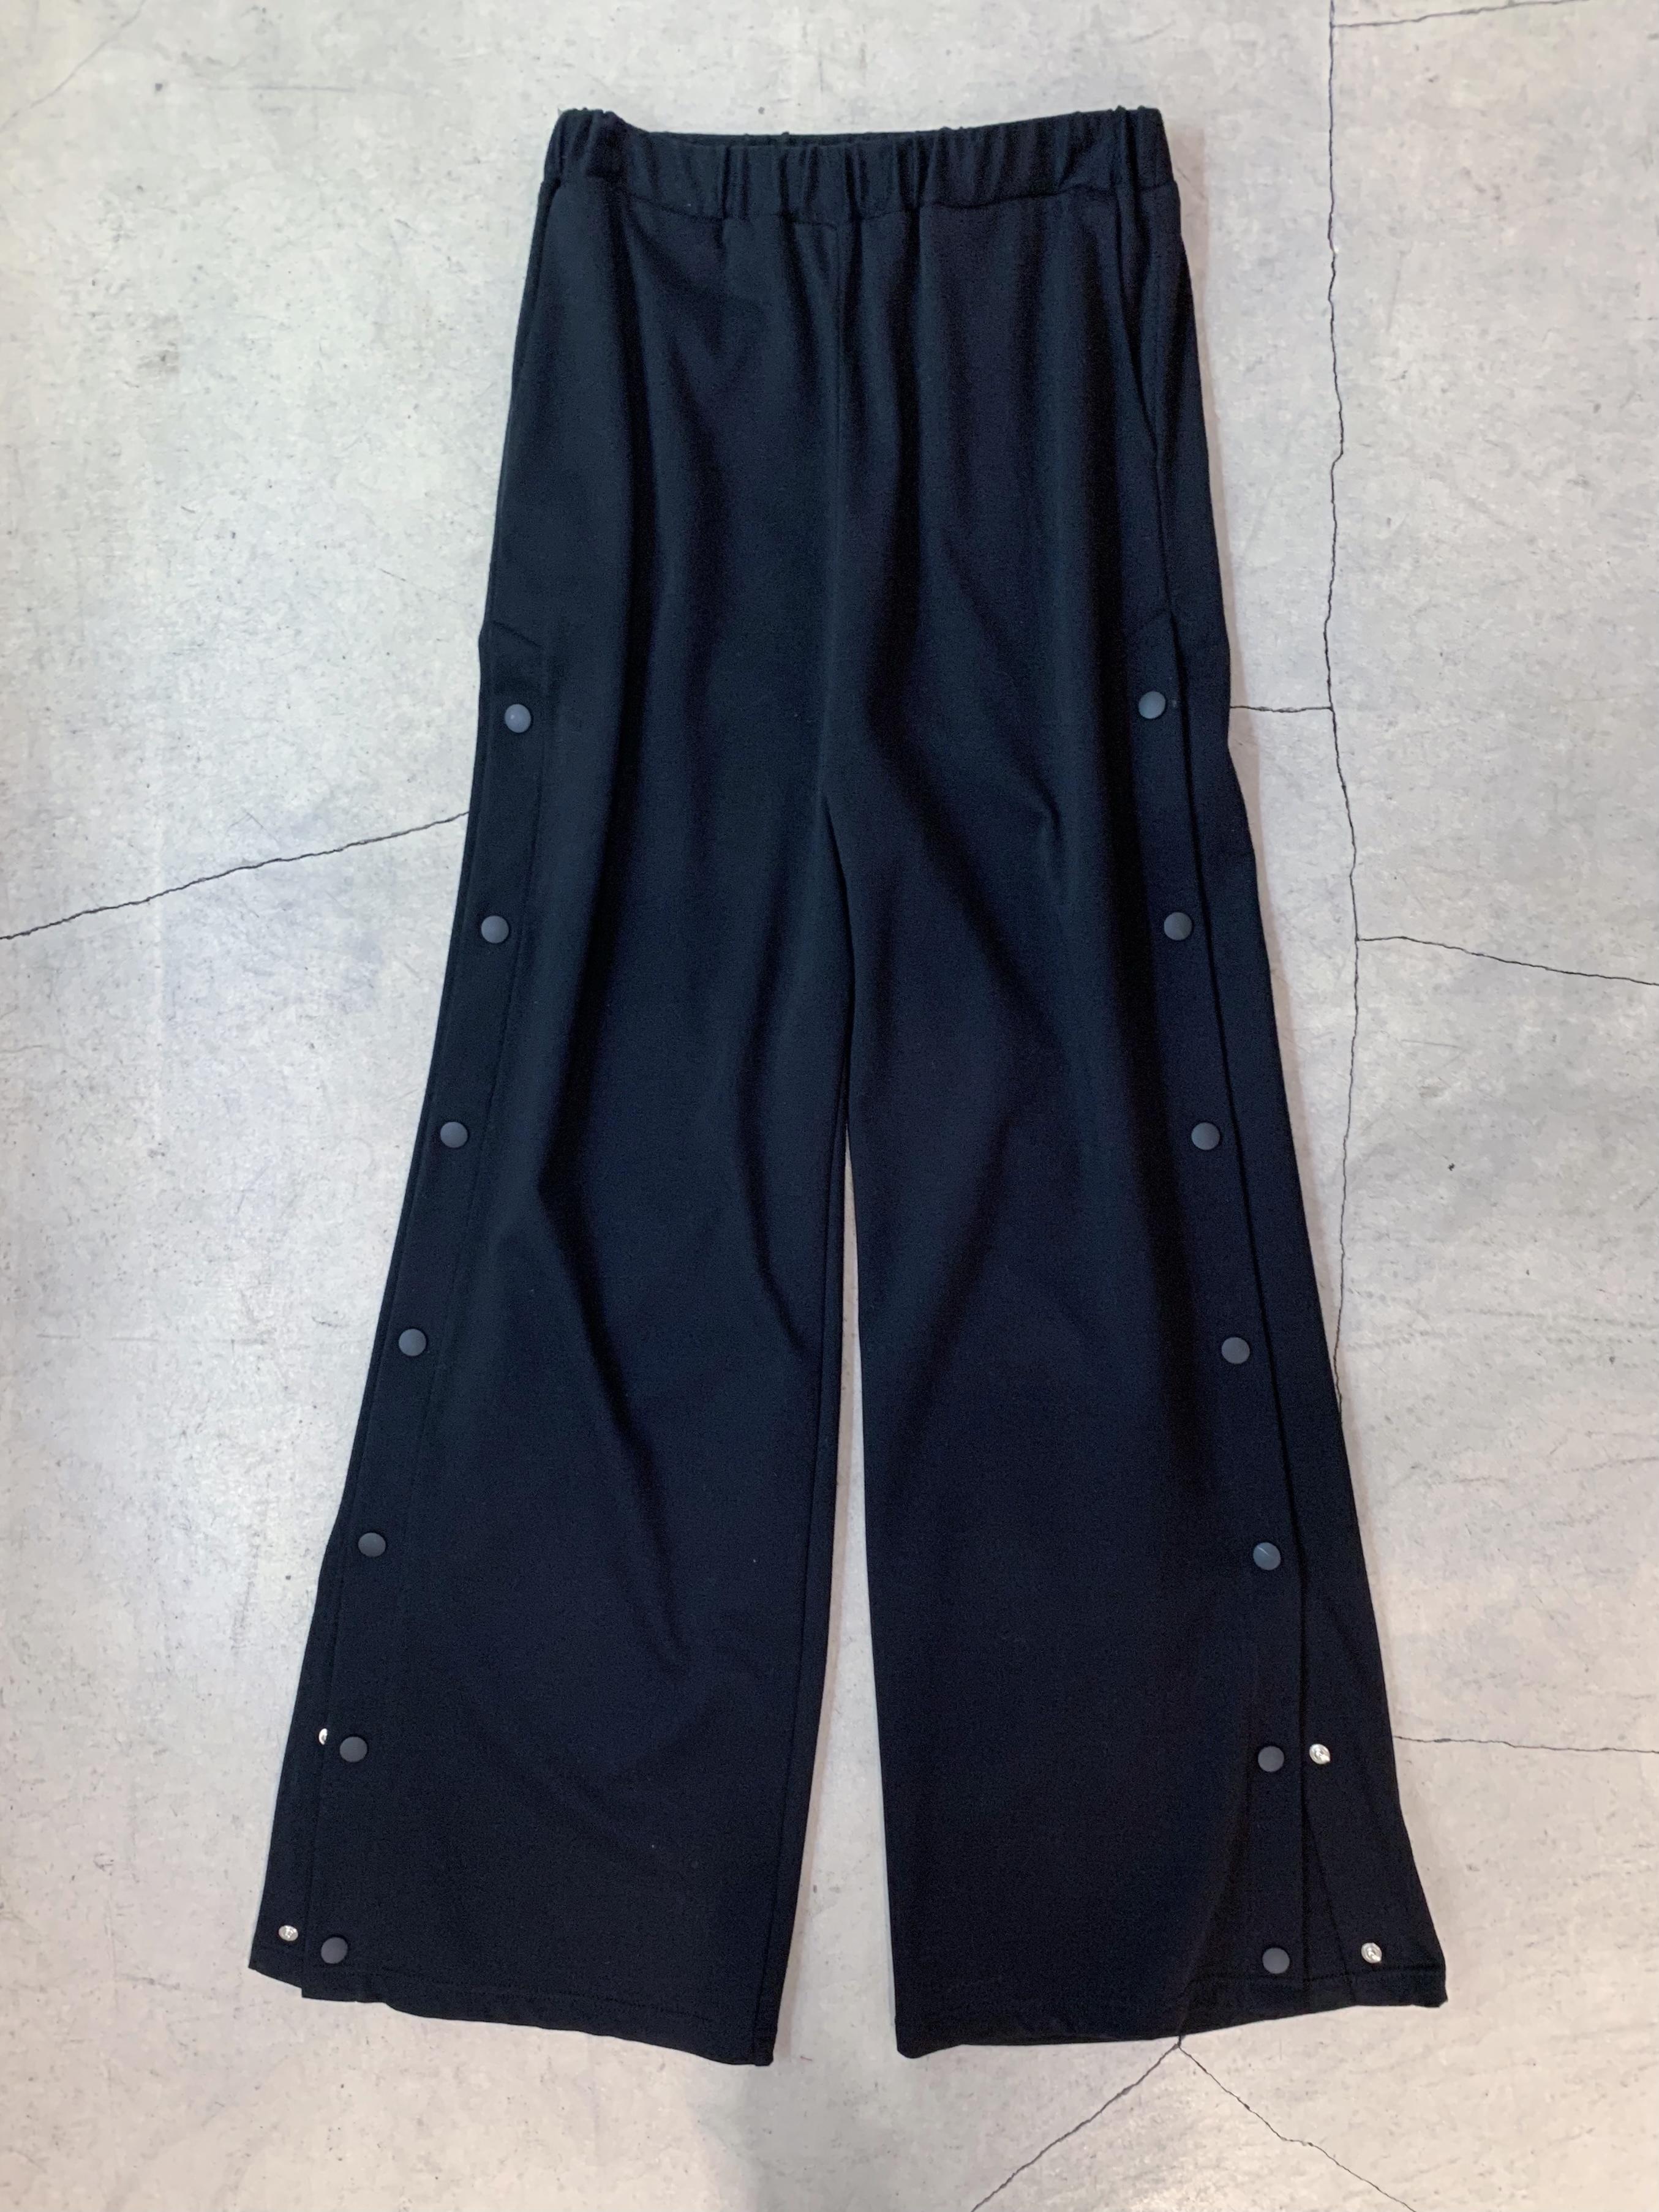 CaNARi track pants